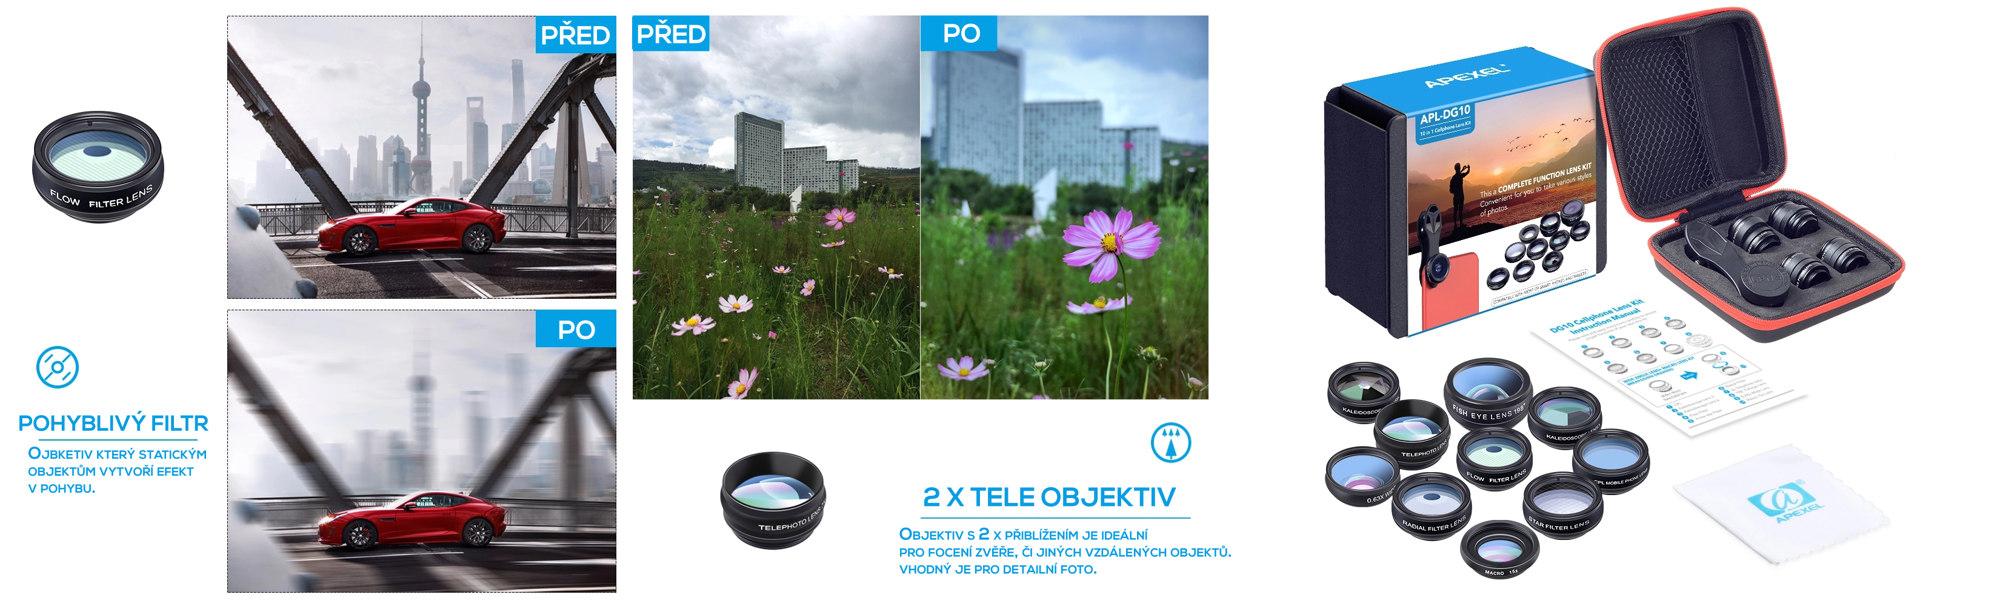 sada_apexel_objektivy_10v1_2